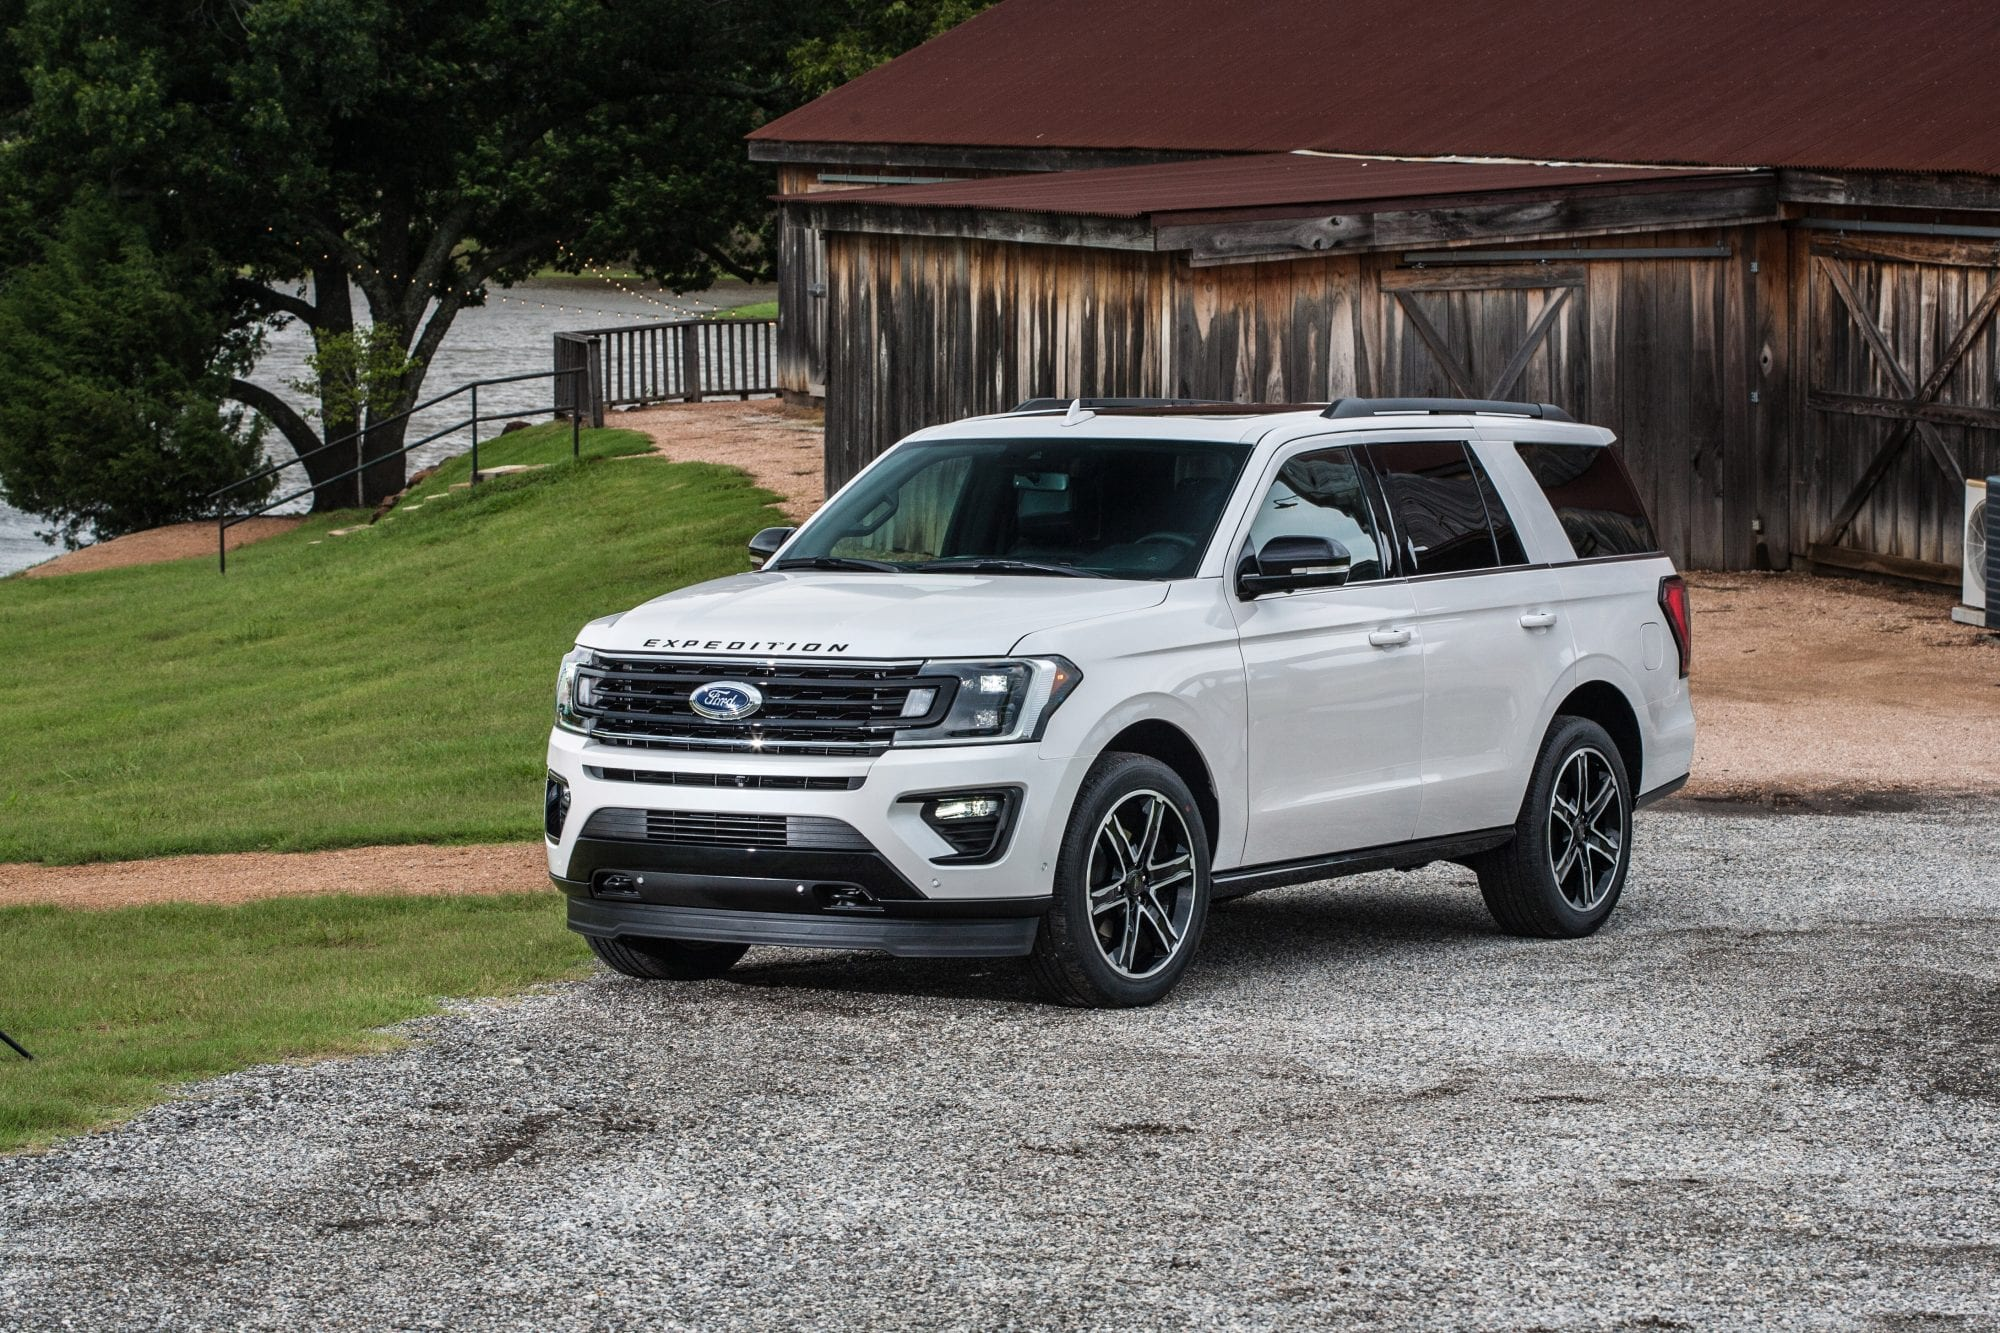 2019 Ford Expedition - Cincinnati Auto ExpoCincinnati Auto ...